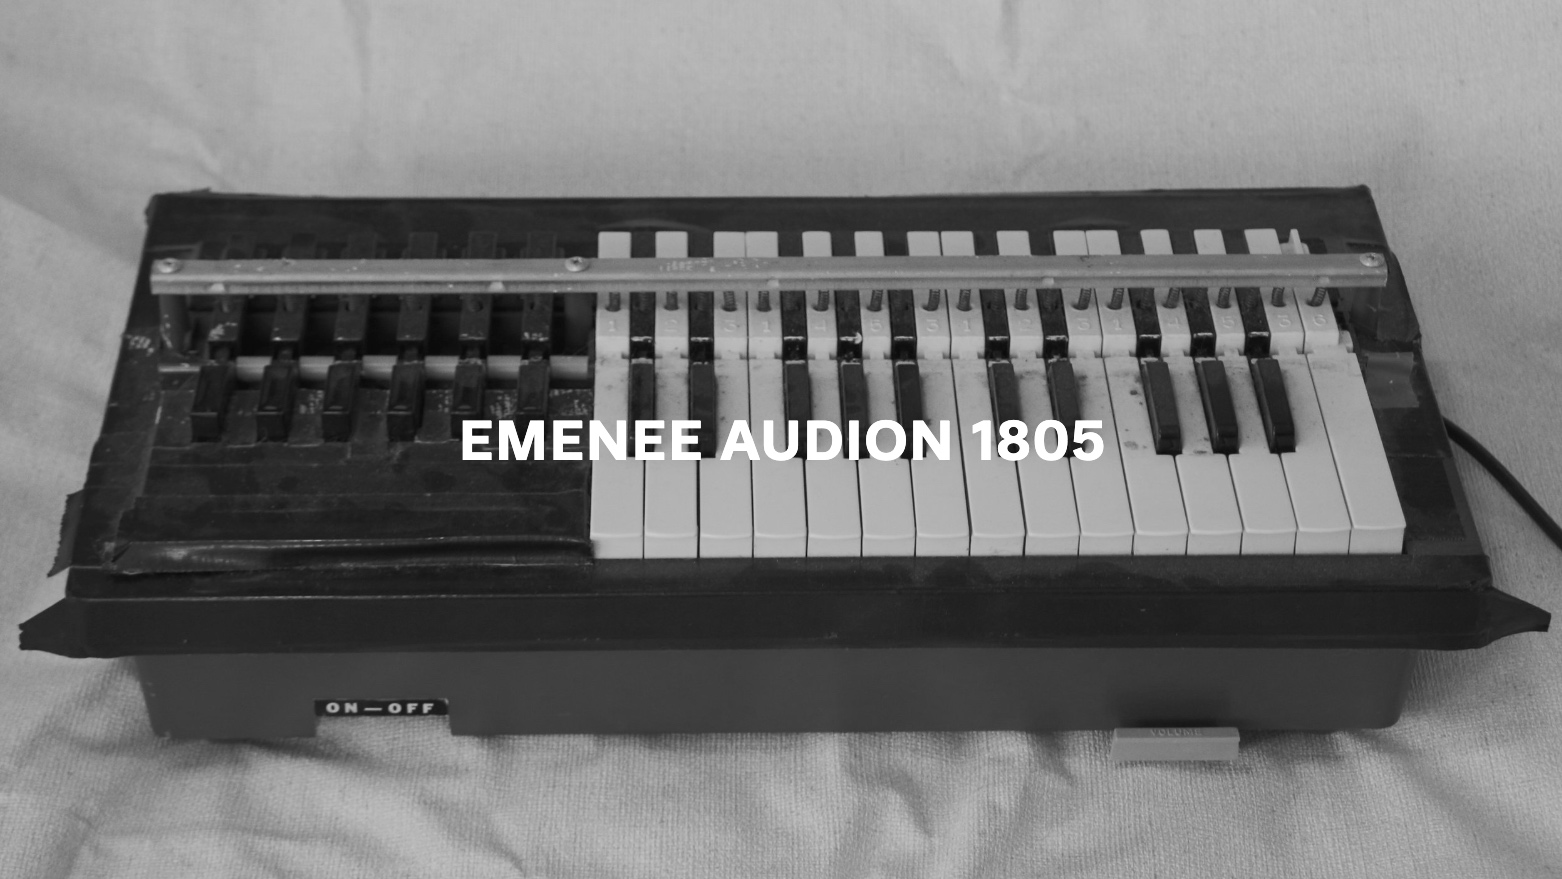 Emenee Audion 1805 Text.jpg